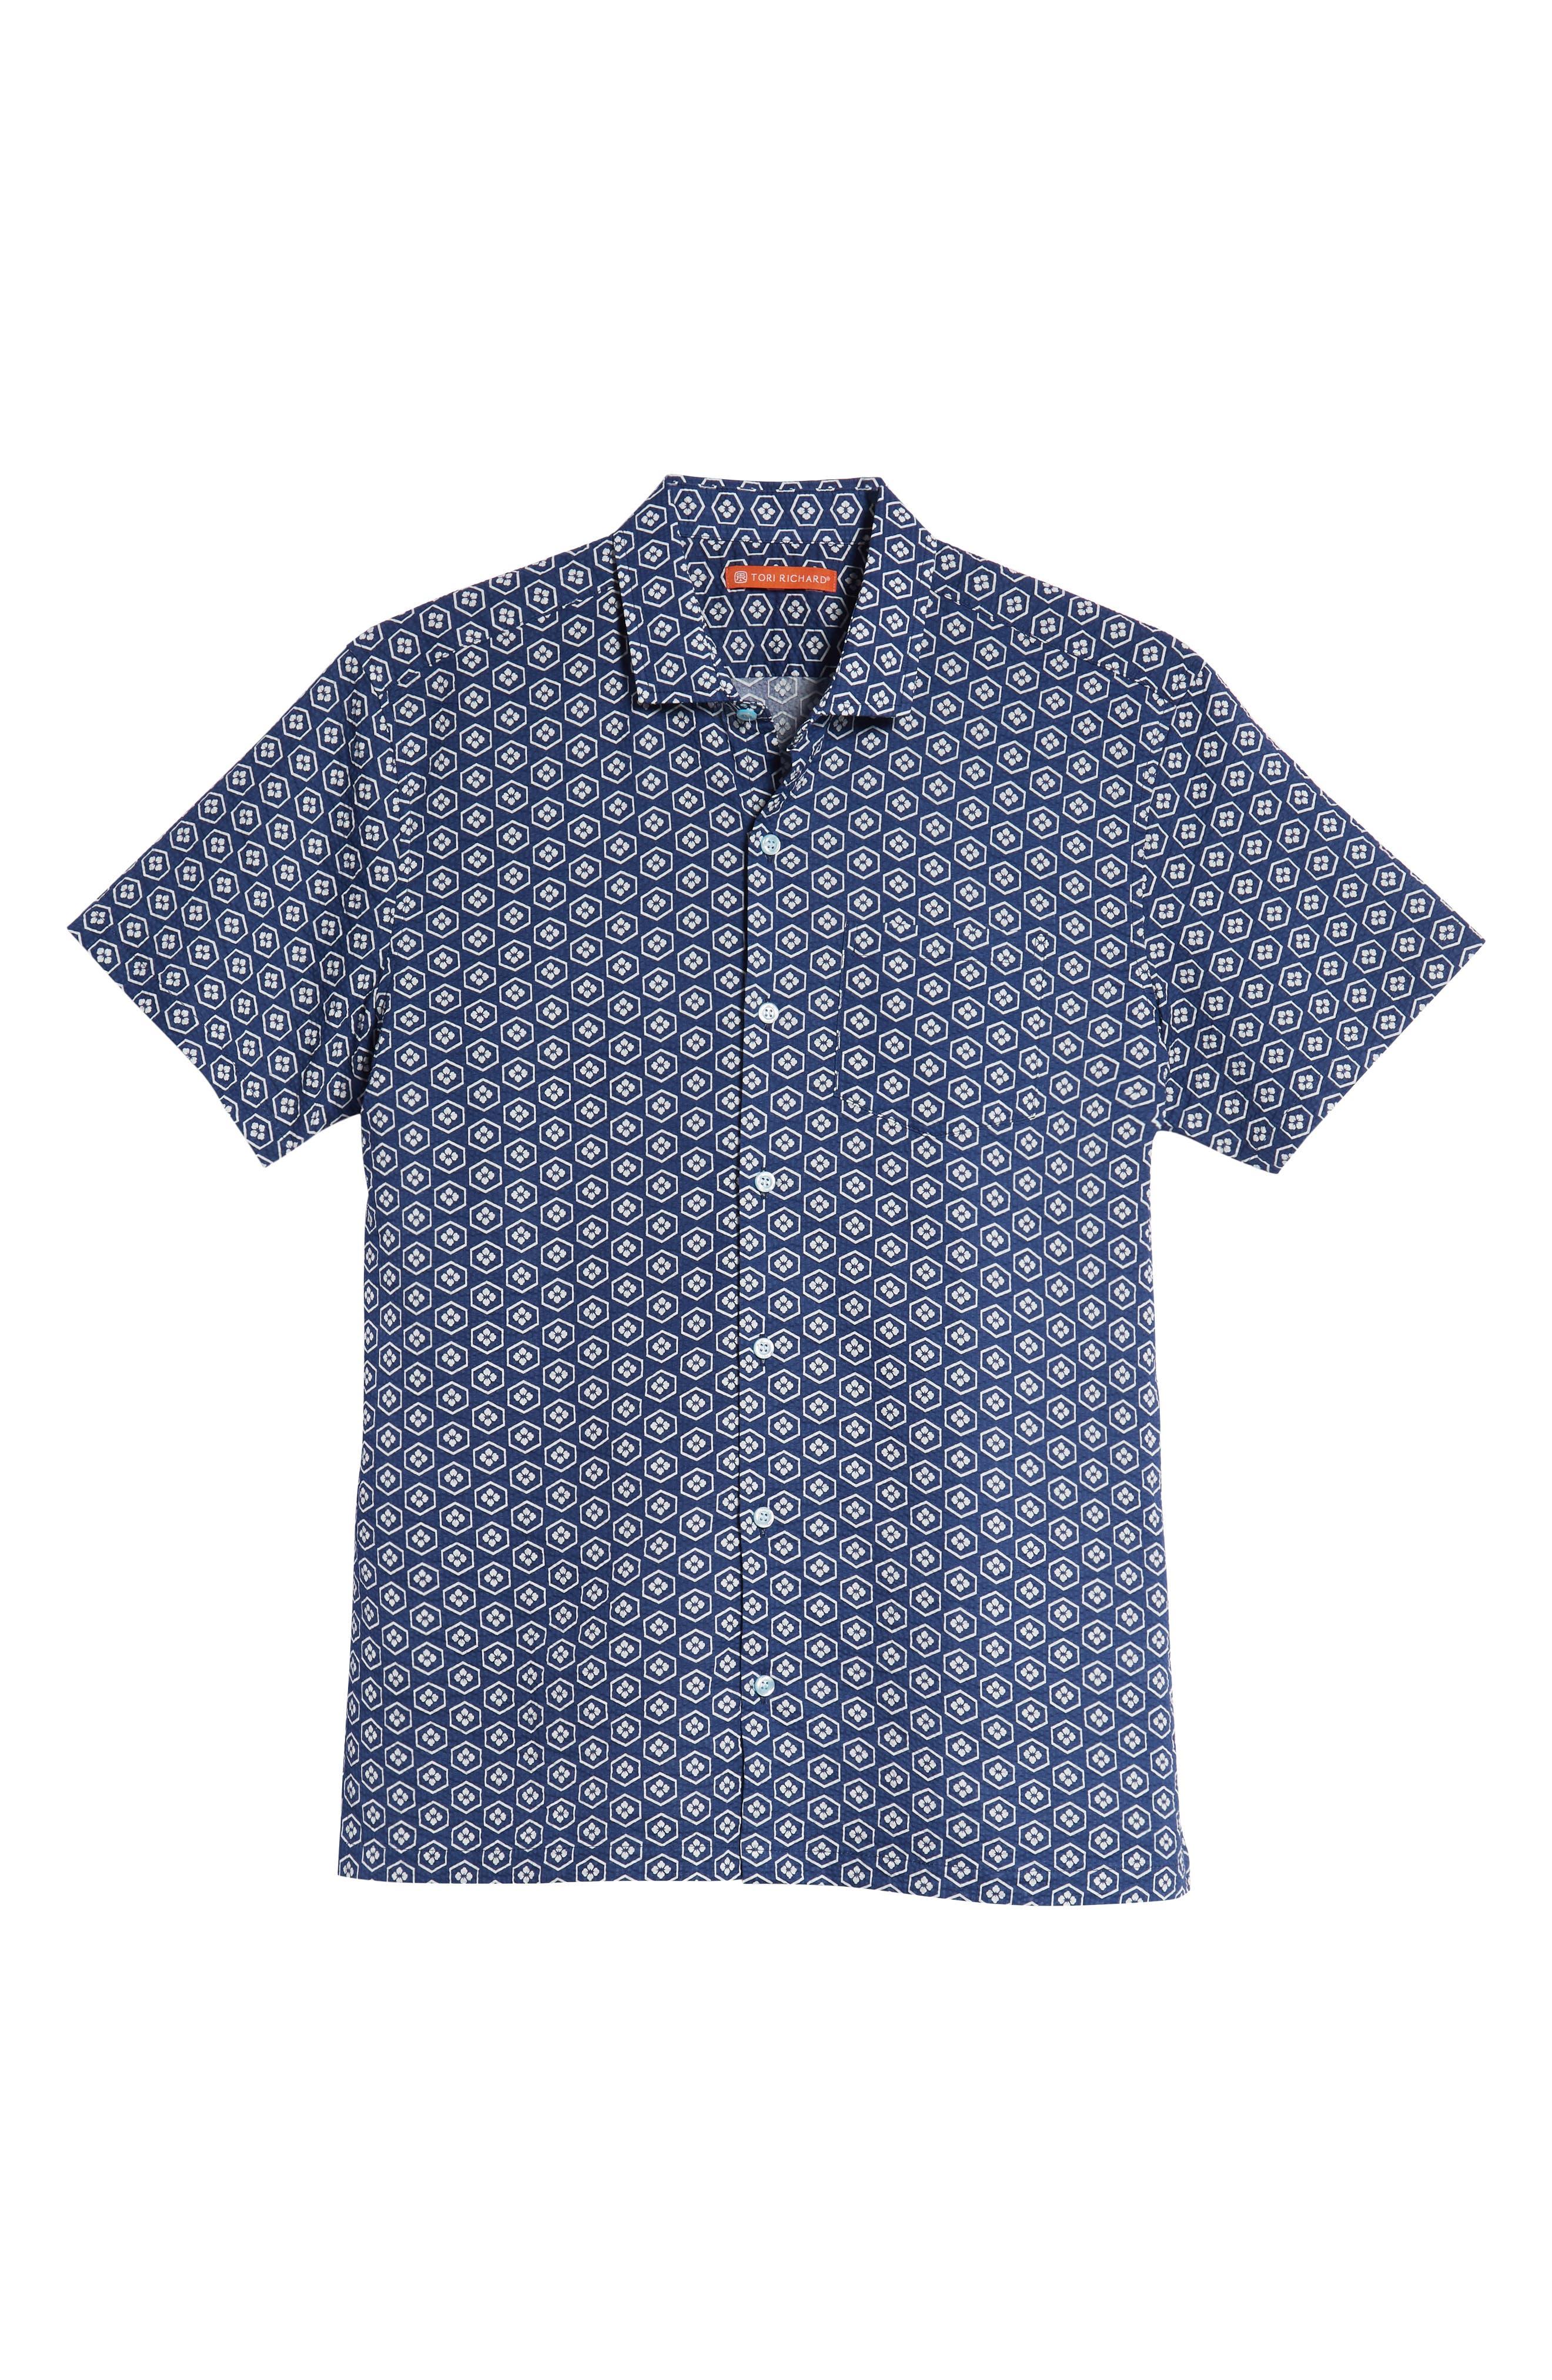 Regular Fit Print Sport Shirt,                             Alternate thumbnail 5, color,                             415